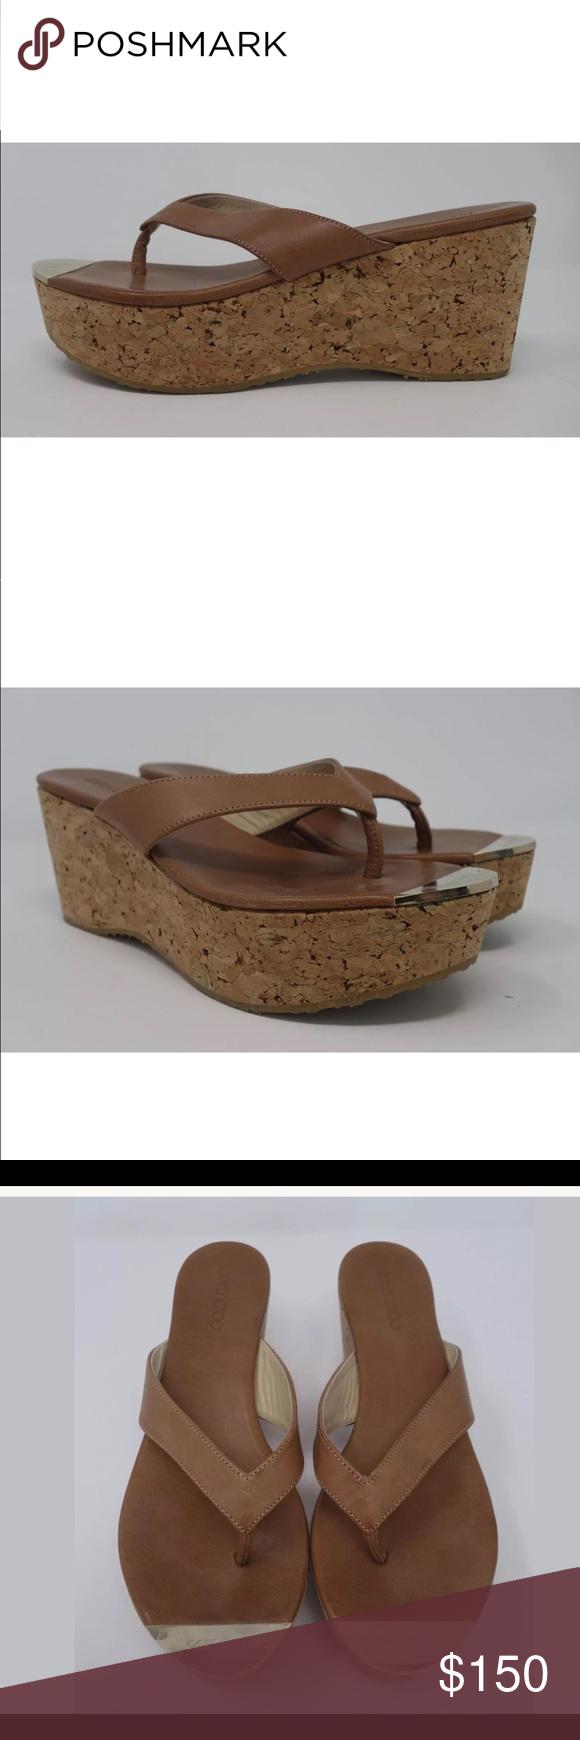 8e1b960a1 JIMMY CHOO Brown Leather Pathos Platform Sandals Designer  Jimmy Choo Size   IT 39 (